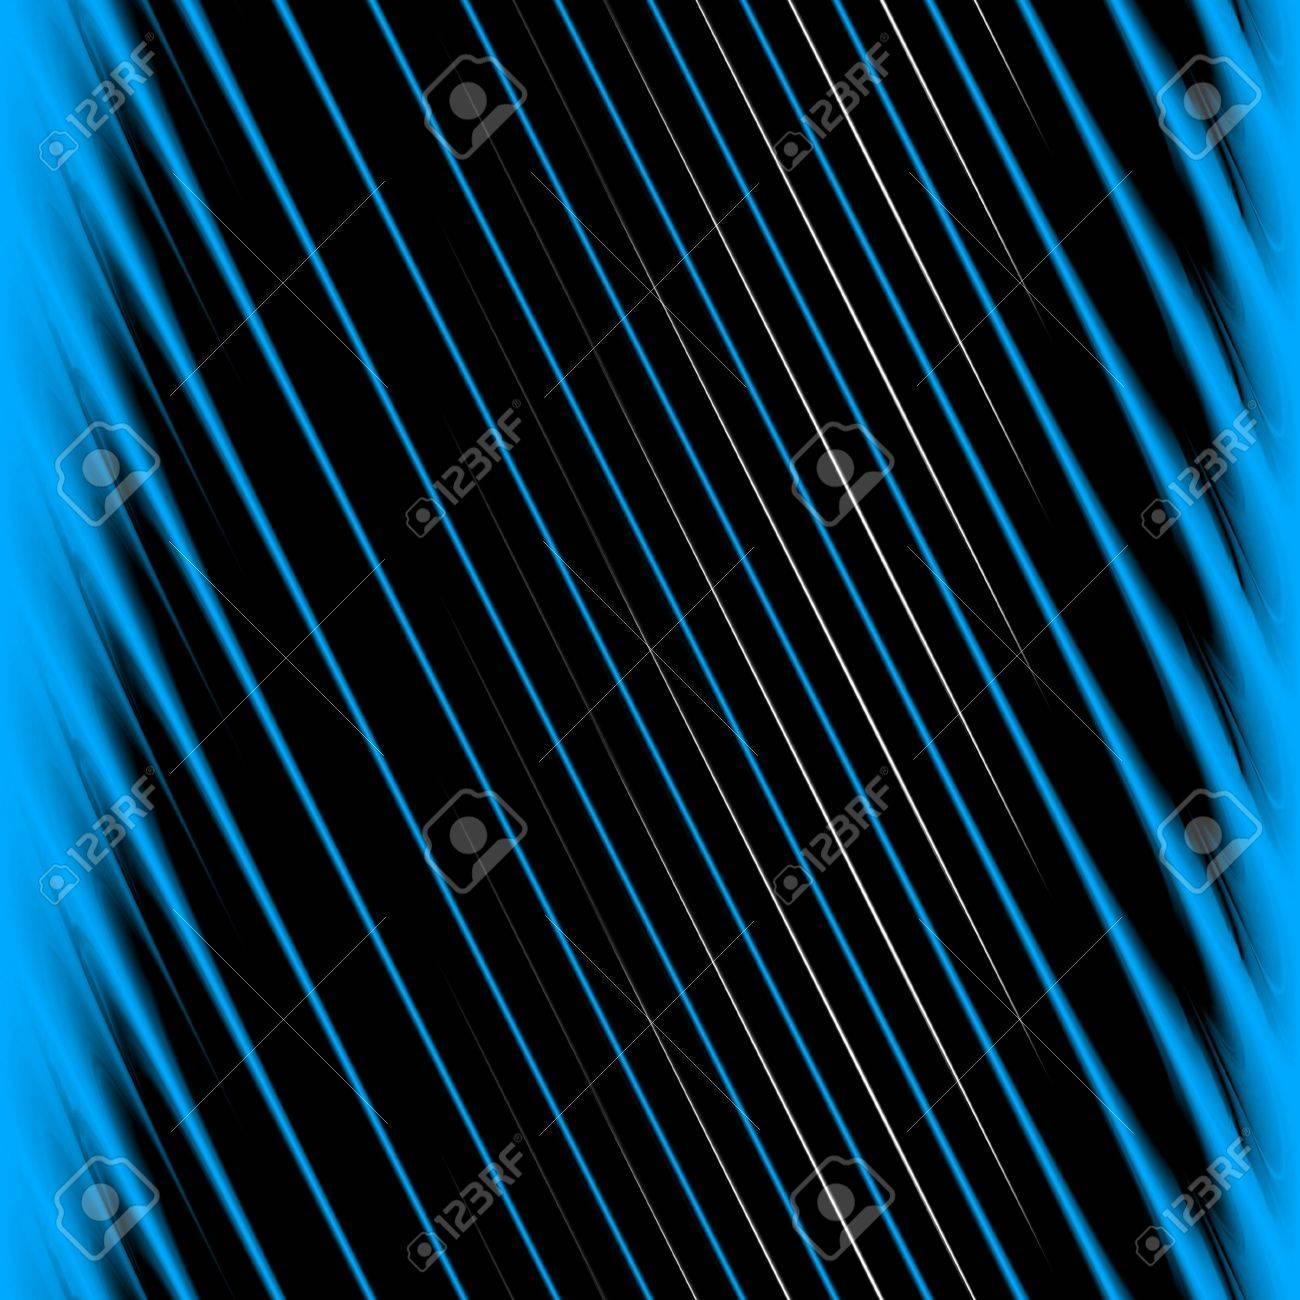 And black diagonal stripes background seamless background or wallpaper - A Background Texture With Red And Black Diagonal Stripes Stock Photo 3838641